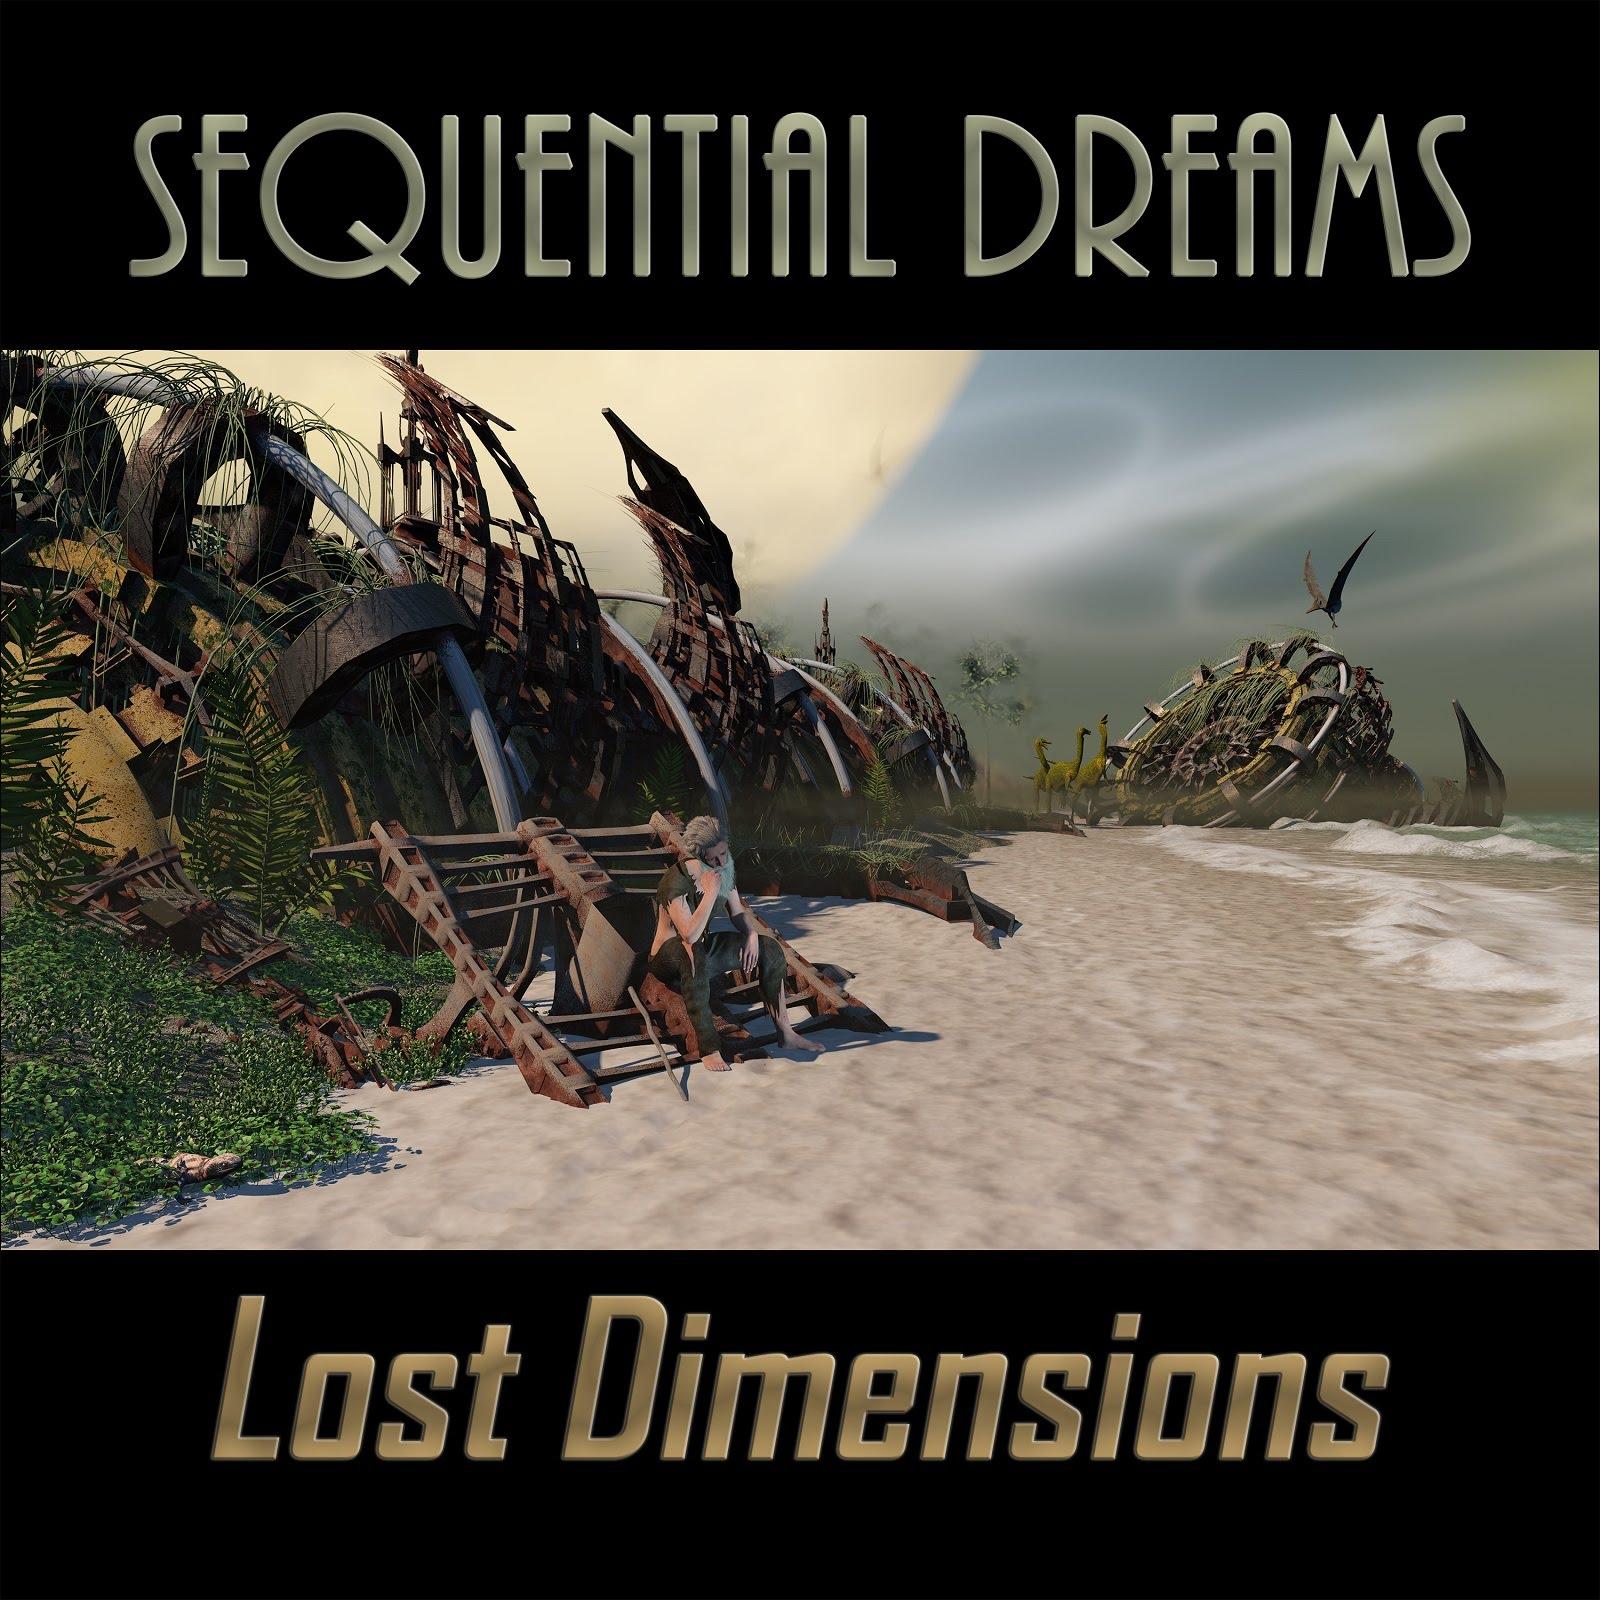 Sequential Dreams - Lost Dimensions